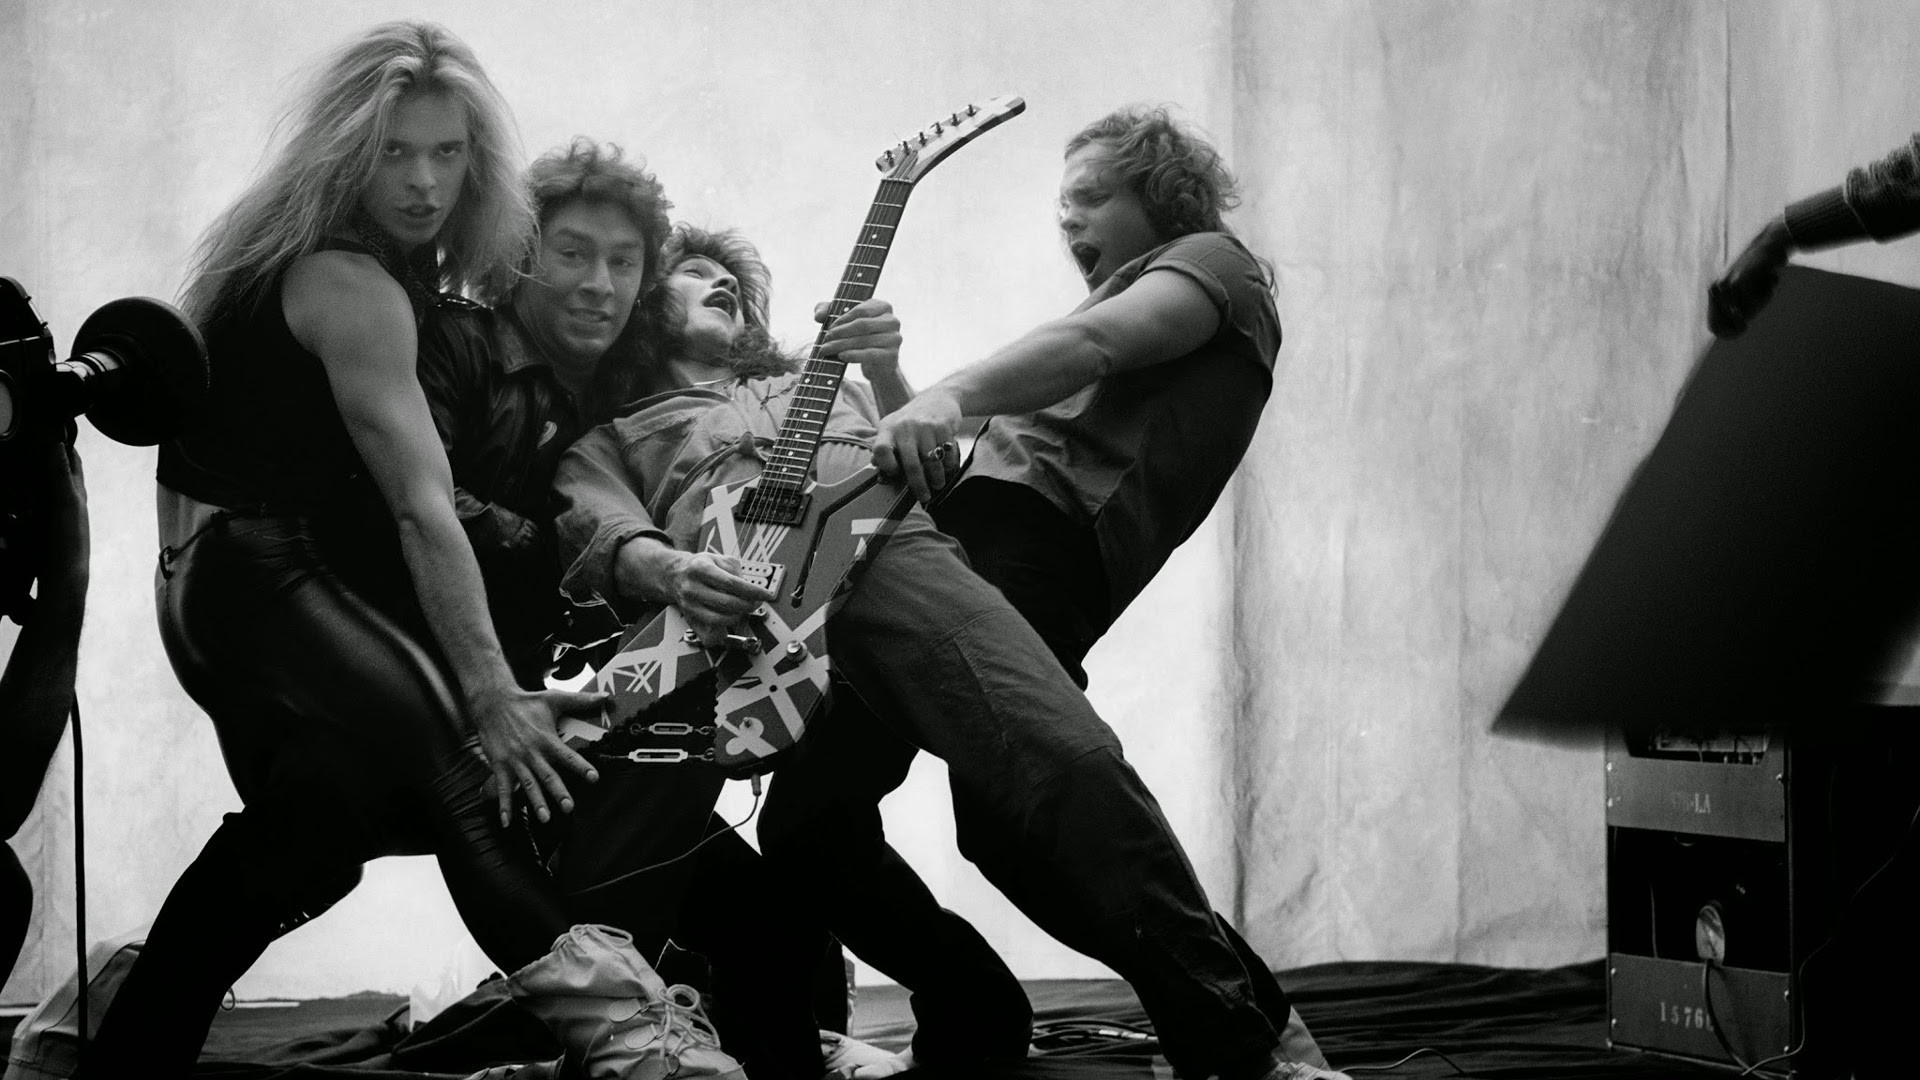 Res: 1920x1080, Van Halen HD Wallpaper | Hintergrund |  | ID:772357 - Wallpaper  Abyss